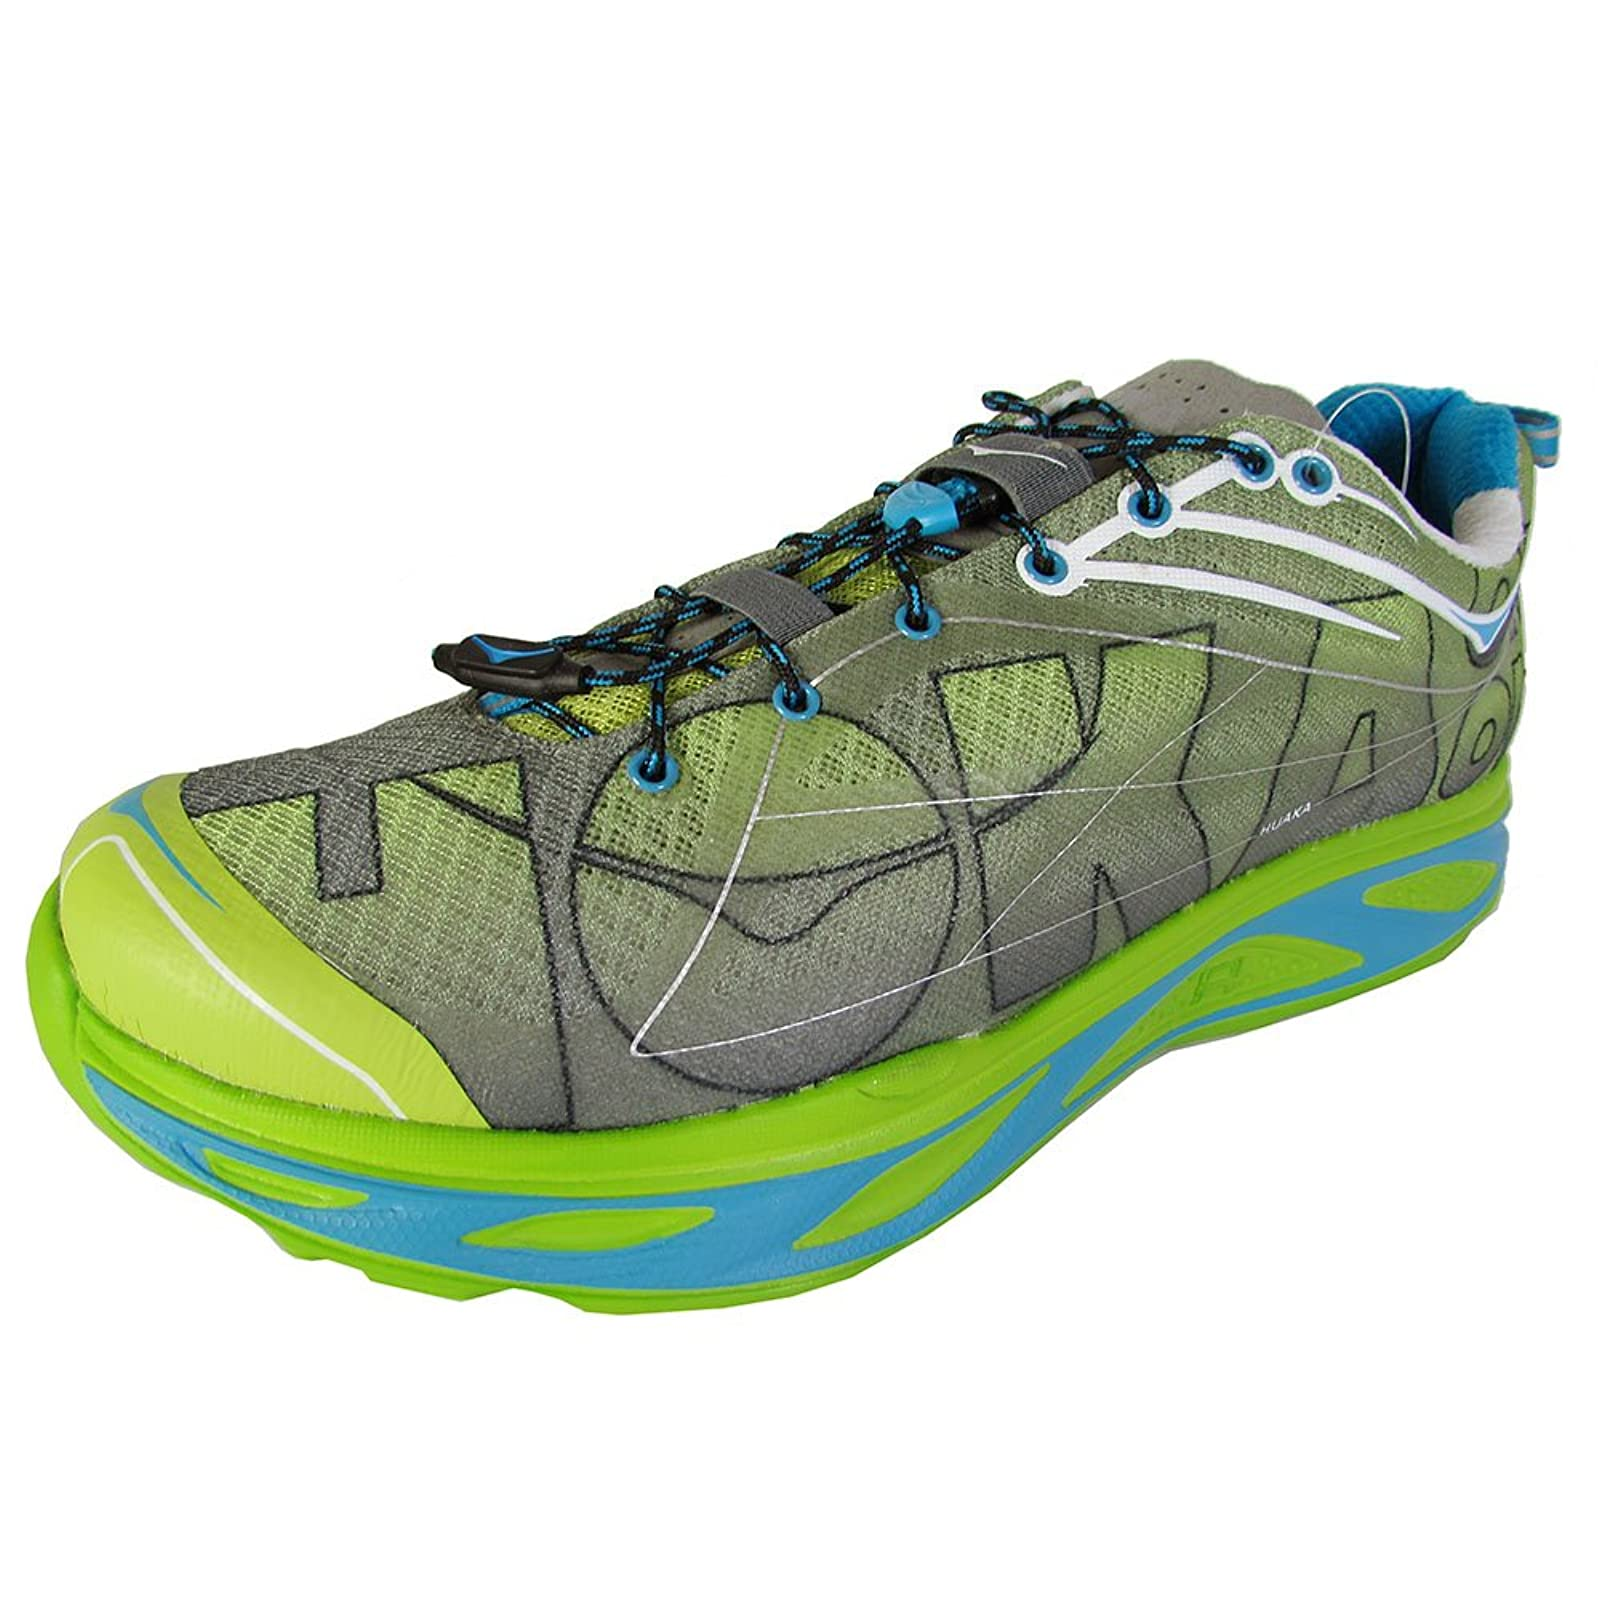 HOKA ONE ONE Mens Huaka Running Sneaker Shoe 8 M US - 3